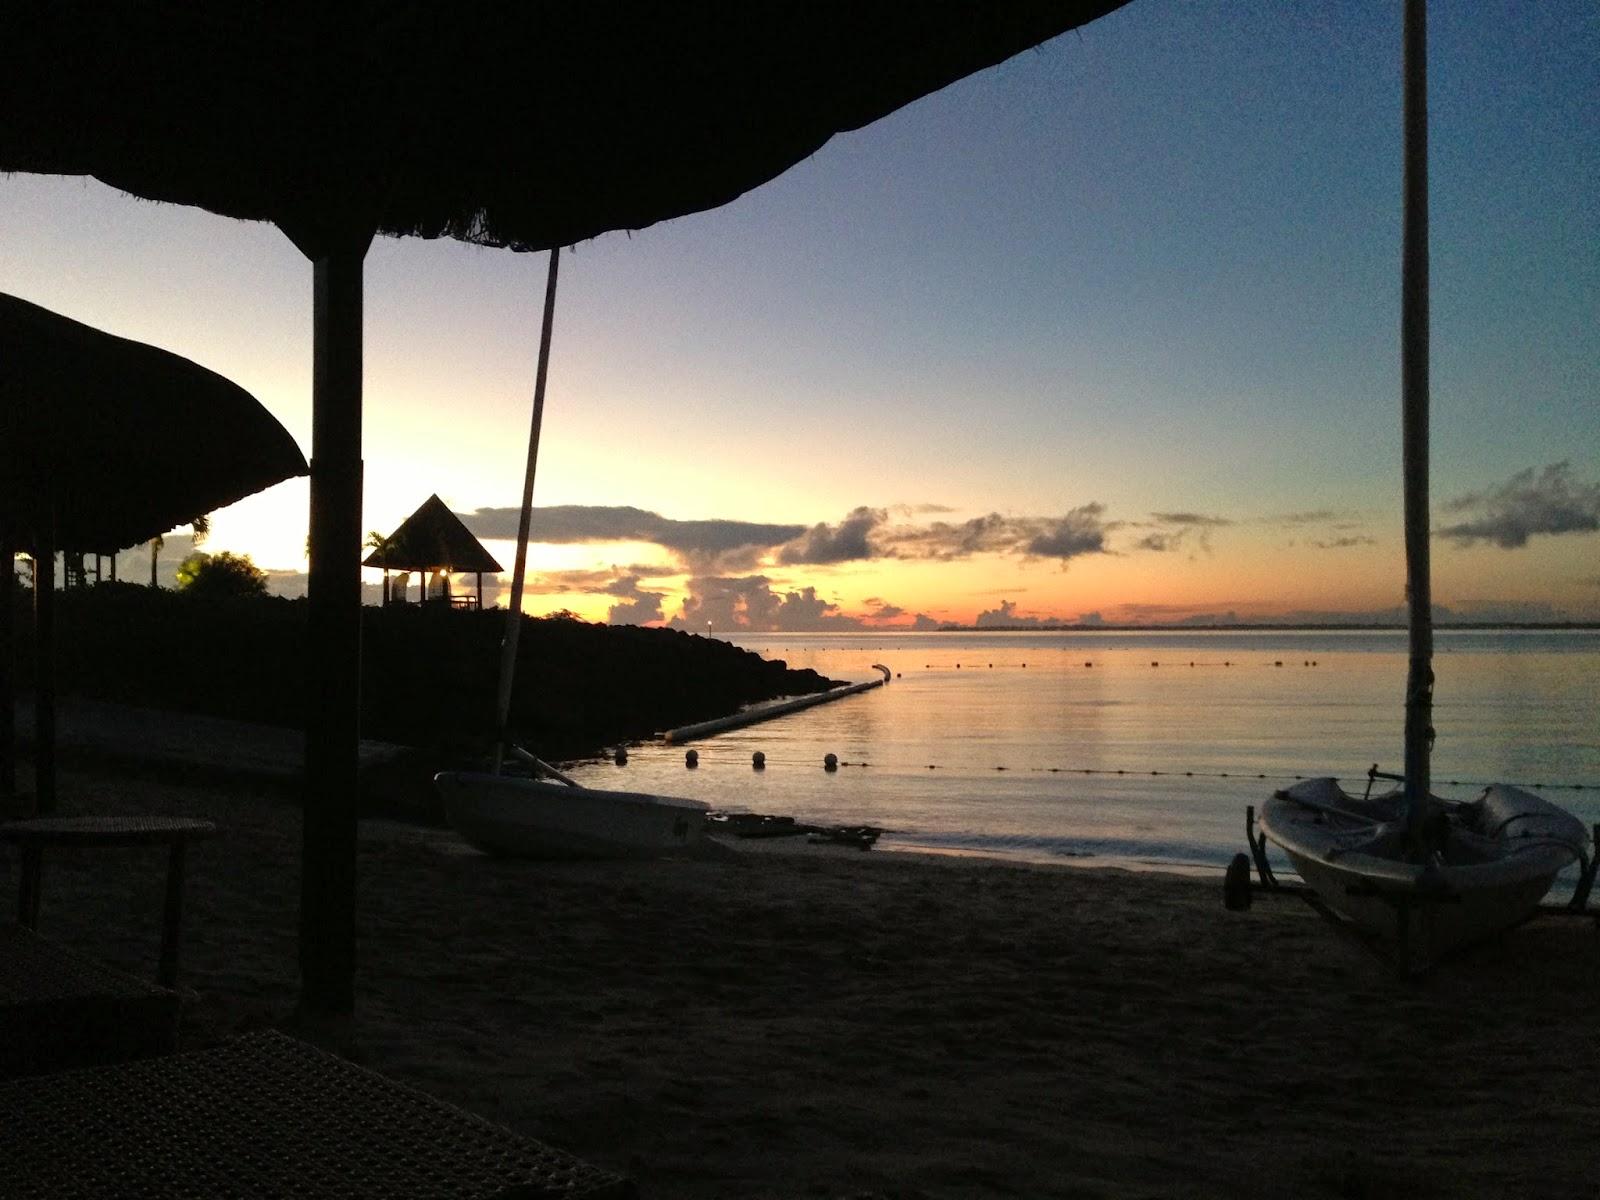 Sunrise, Shangrila Mactan Resort & Spa, Cebu, Philippines